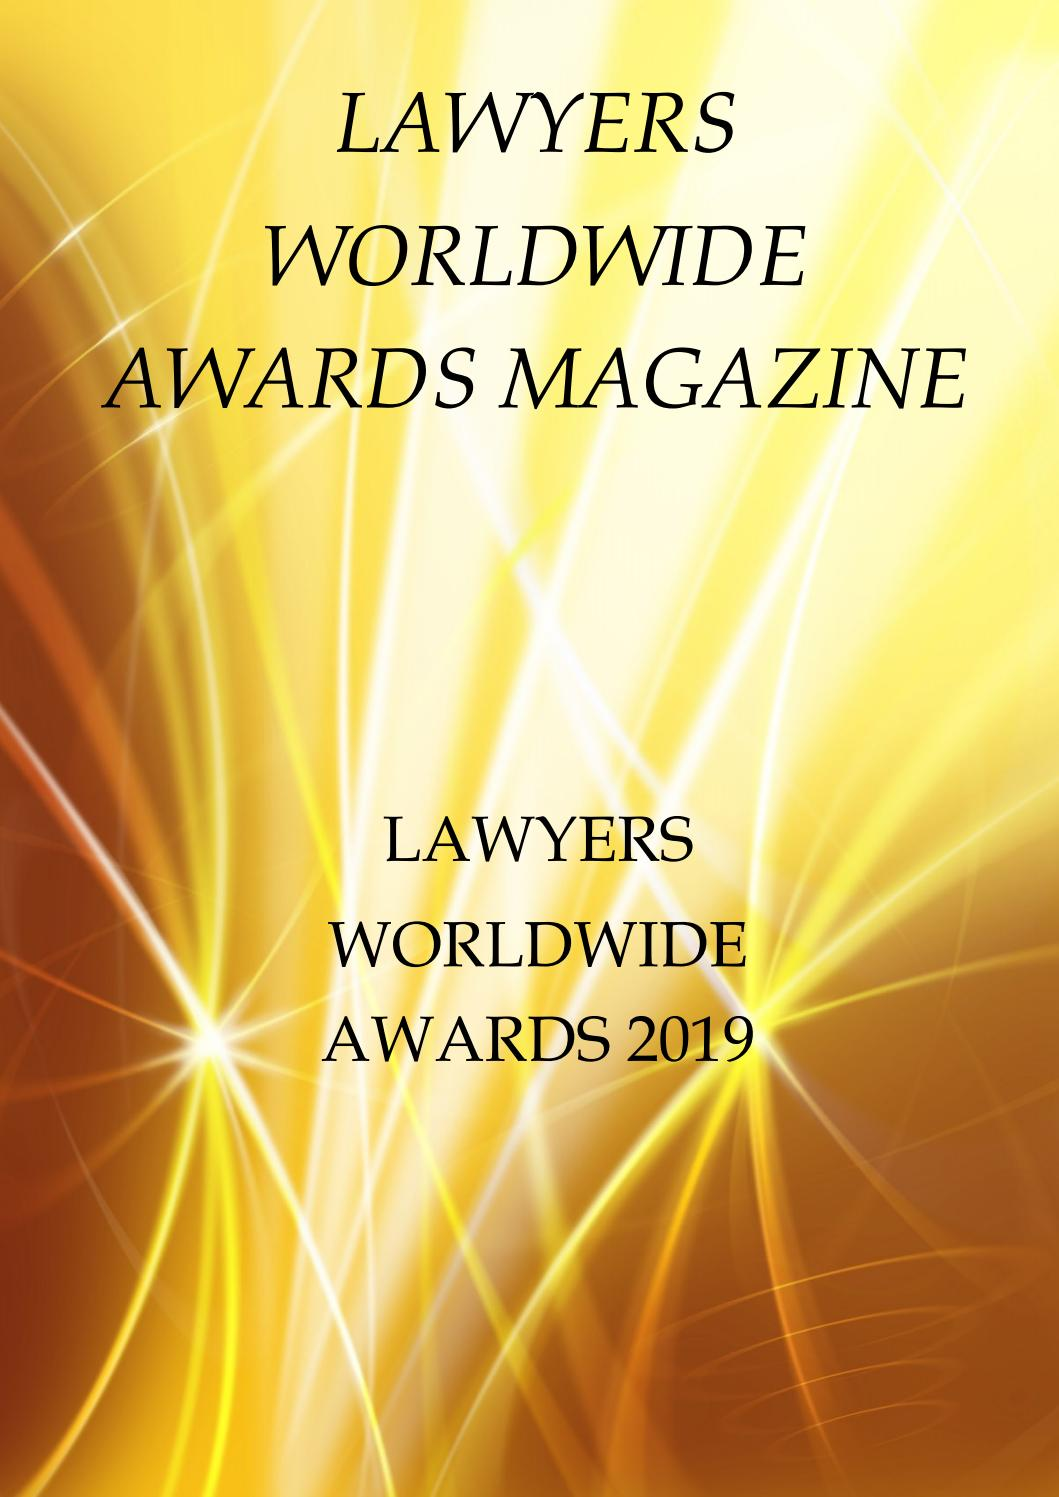 Lawyers Worldwide Awards 2019 by Productive Media - issuu